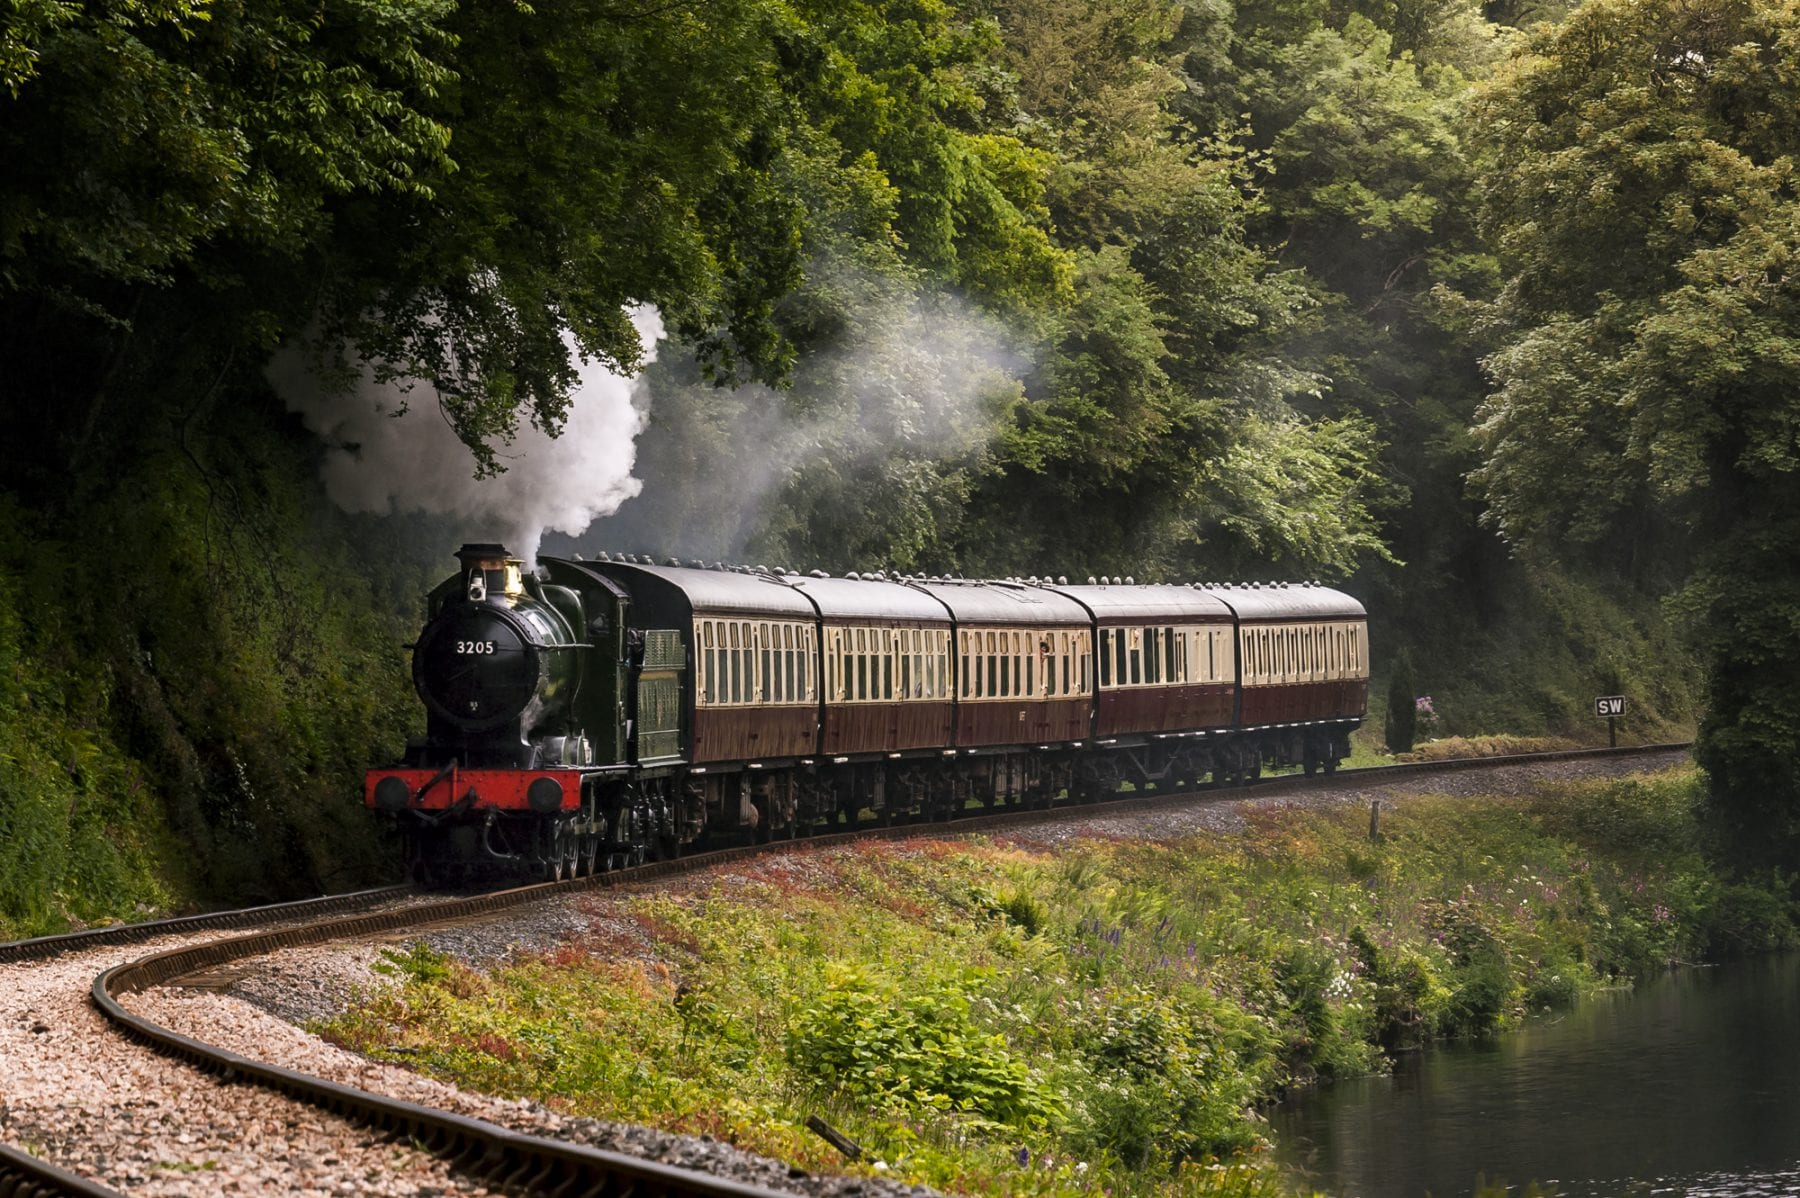 Train travelling on track on South Devon Railway